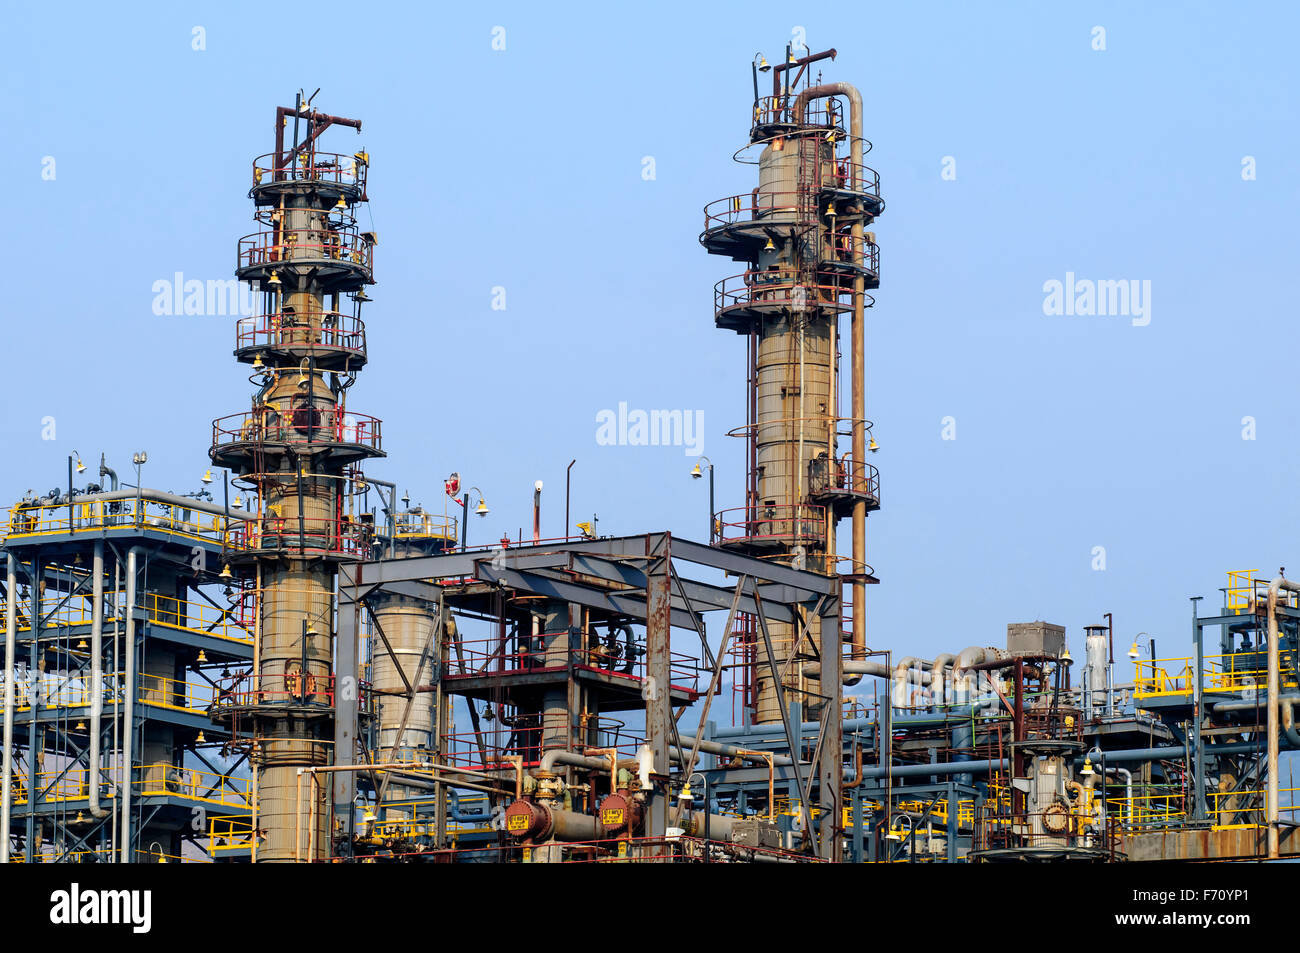 Oil refinery, visakhapatnam, andhra pradesh, india, asia